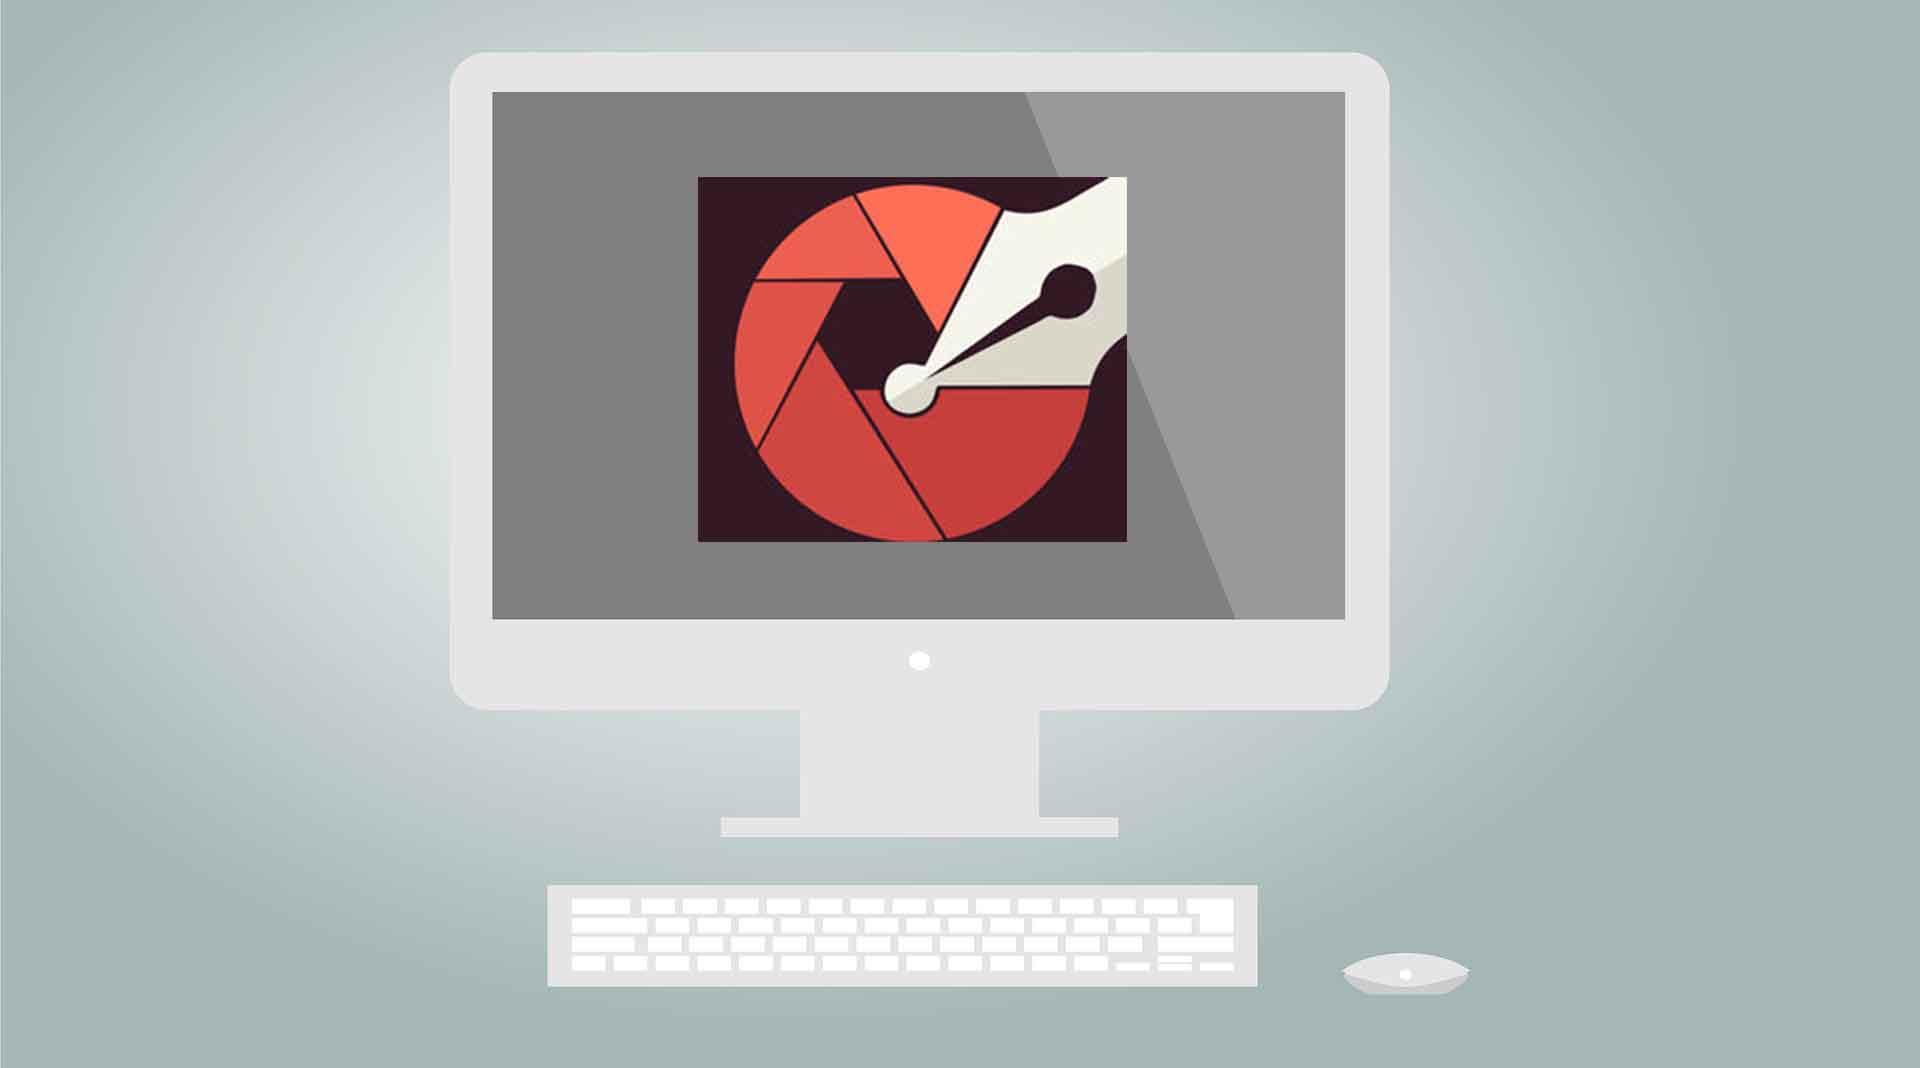 Imaengine For Pc Free Download Windows 7 8 10 Mac